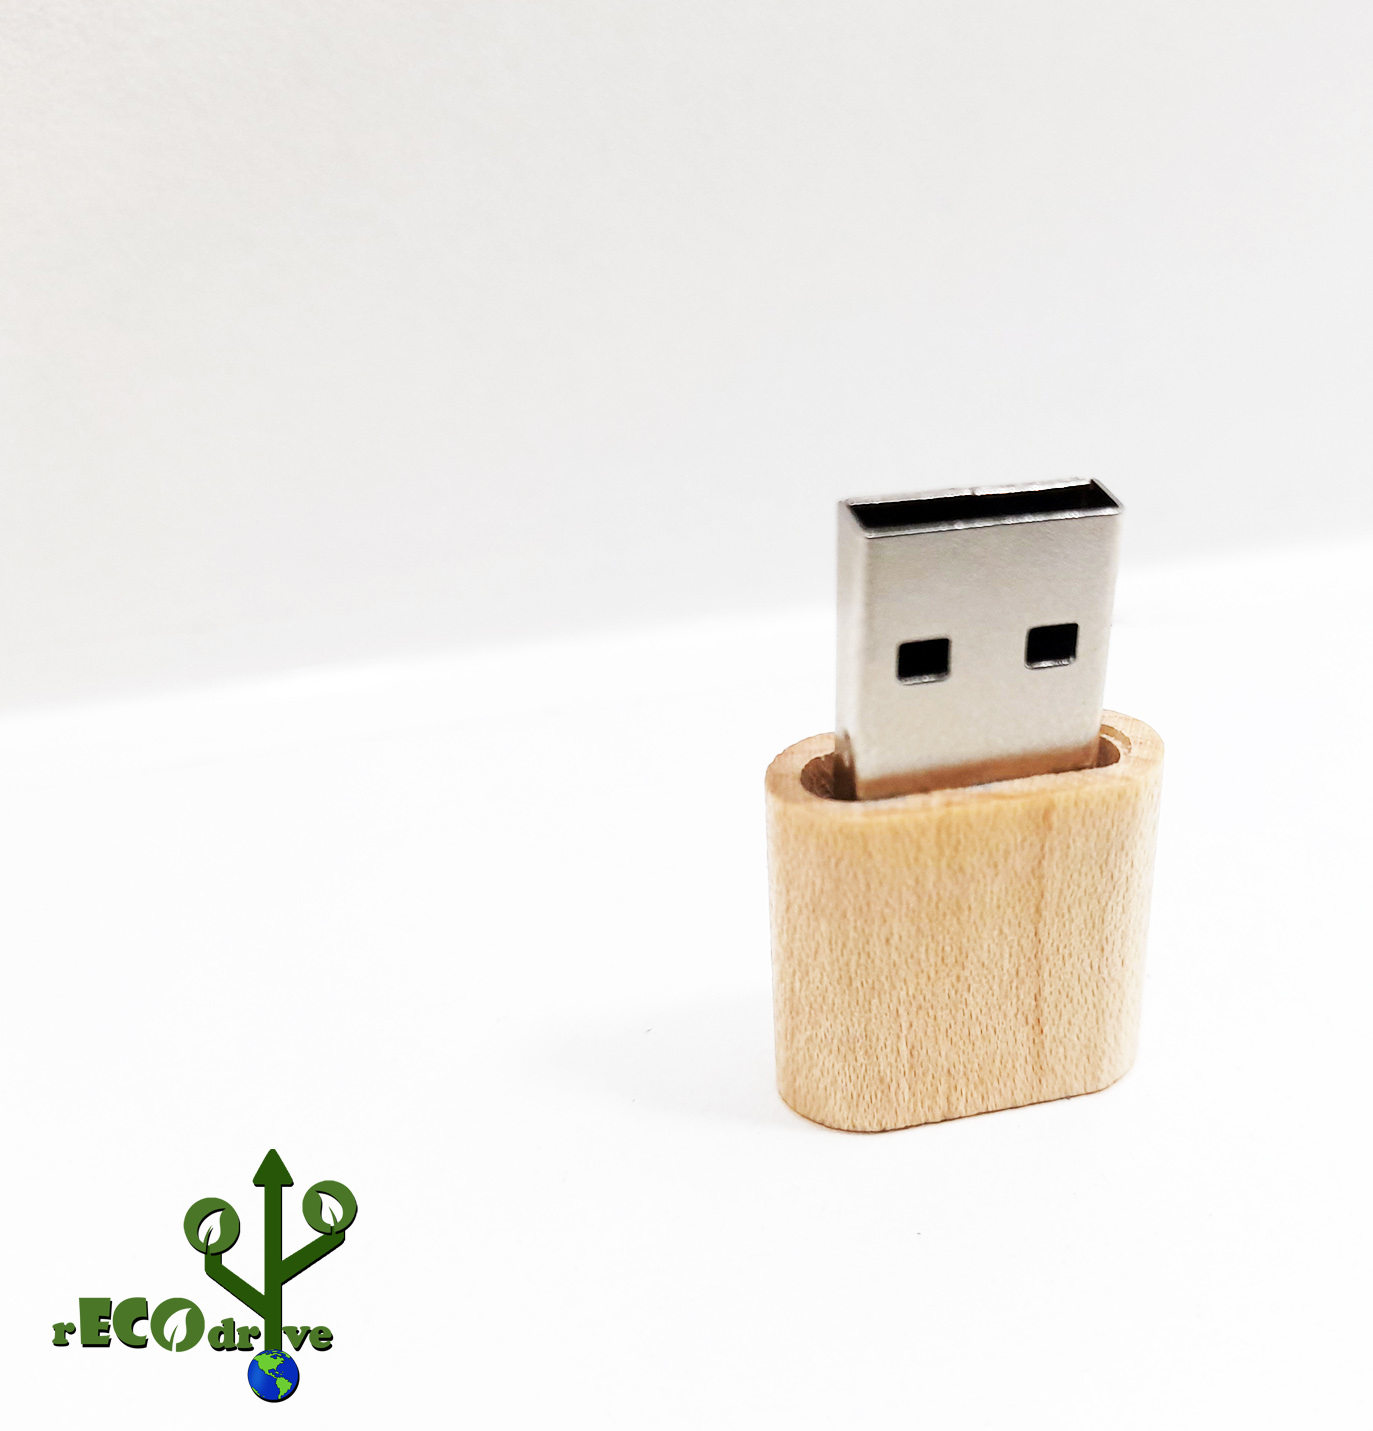 Pendrive Ecológico Fit Slim de 8 GB e 16 GB  - Linha rECOdrive